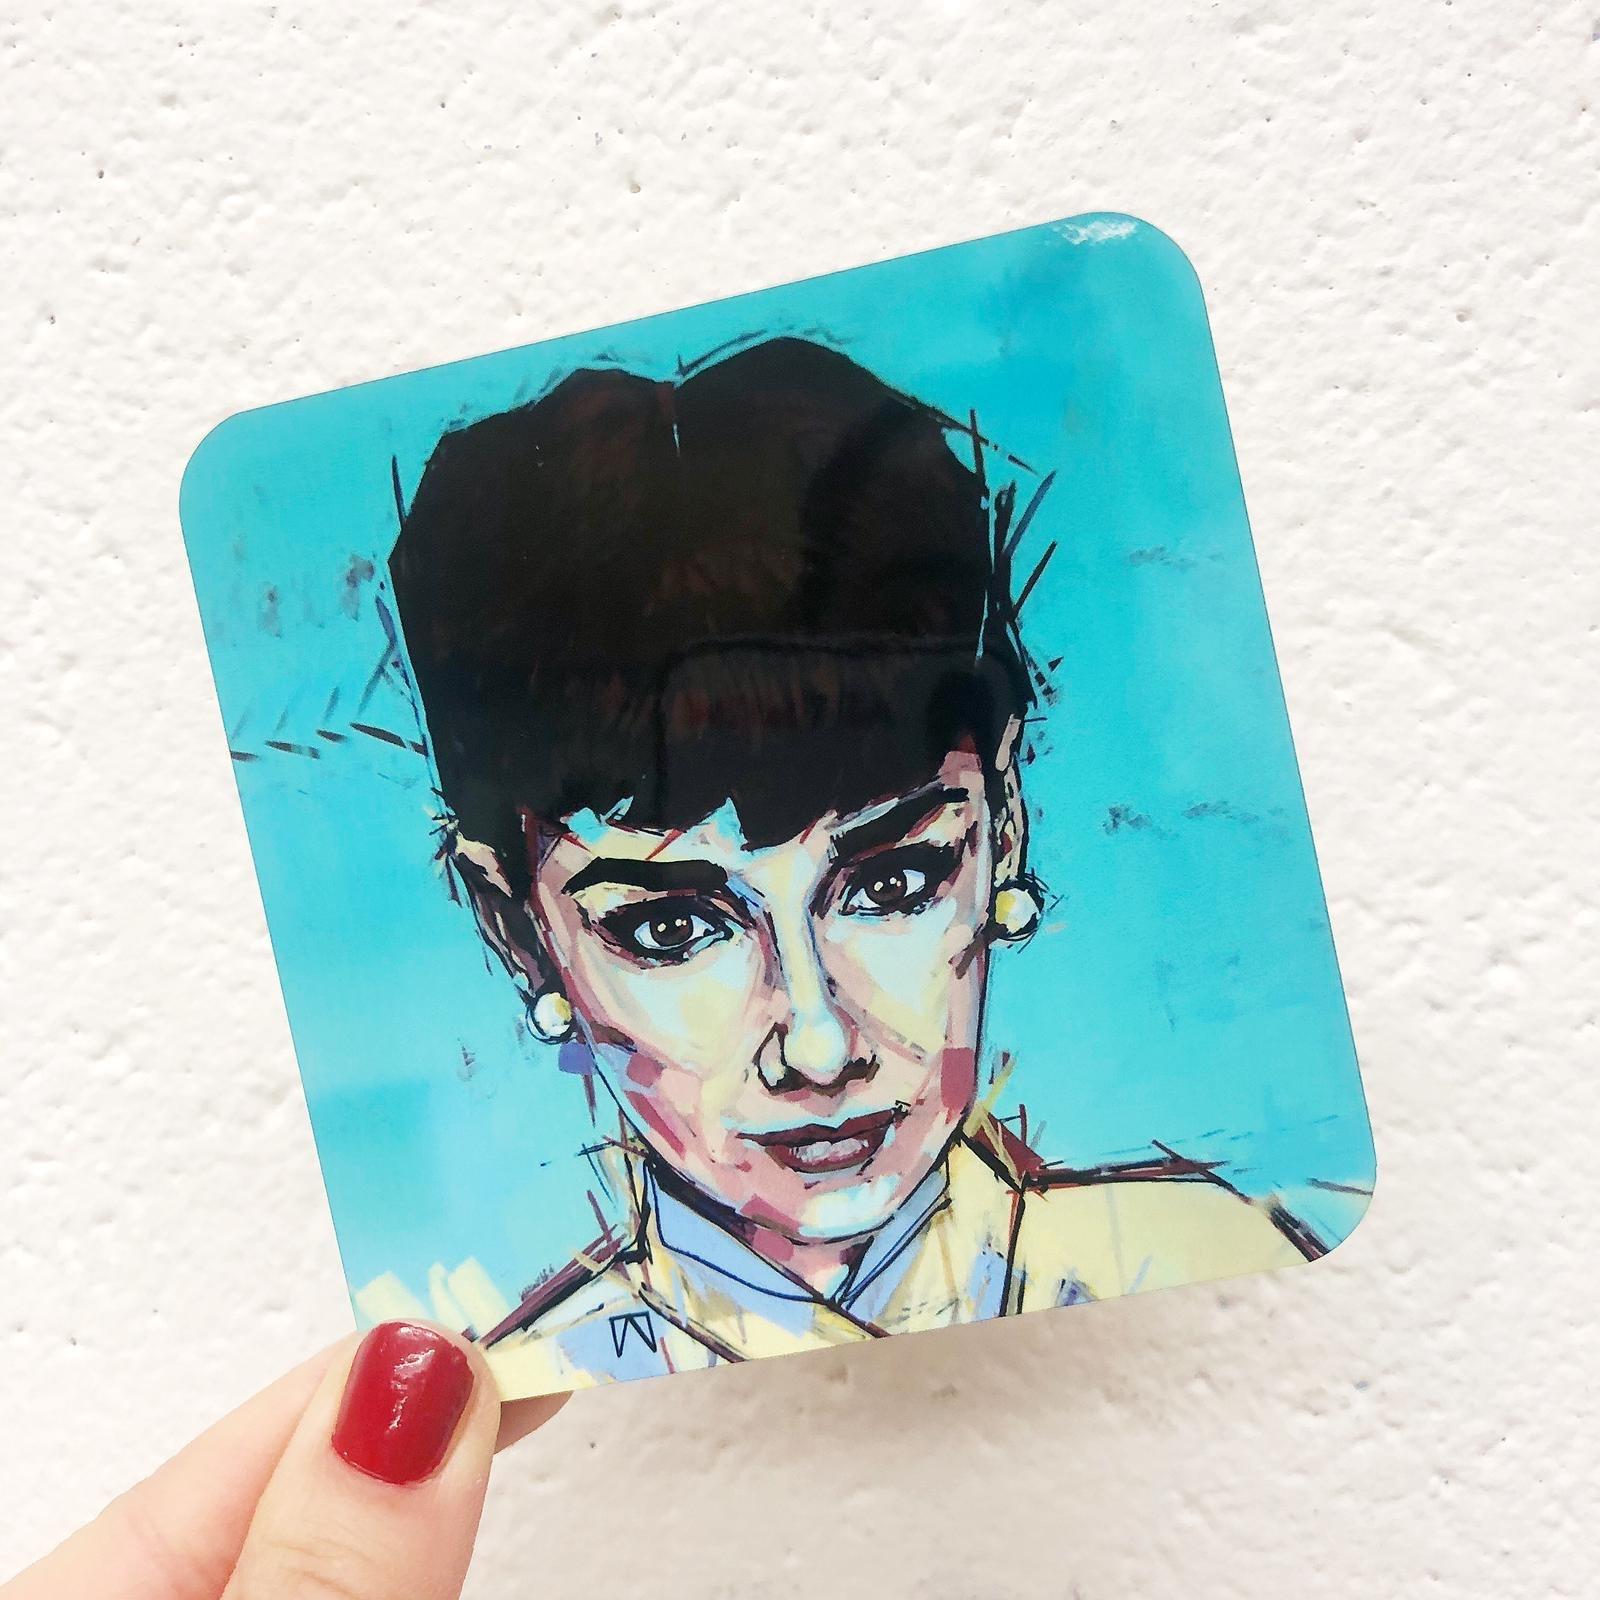 Design your own coasters with ArtWOW: 'AUDREY GAZE' Audrey Hepburn by designer Laura Selevos